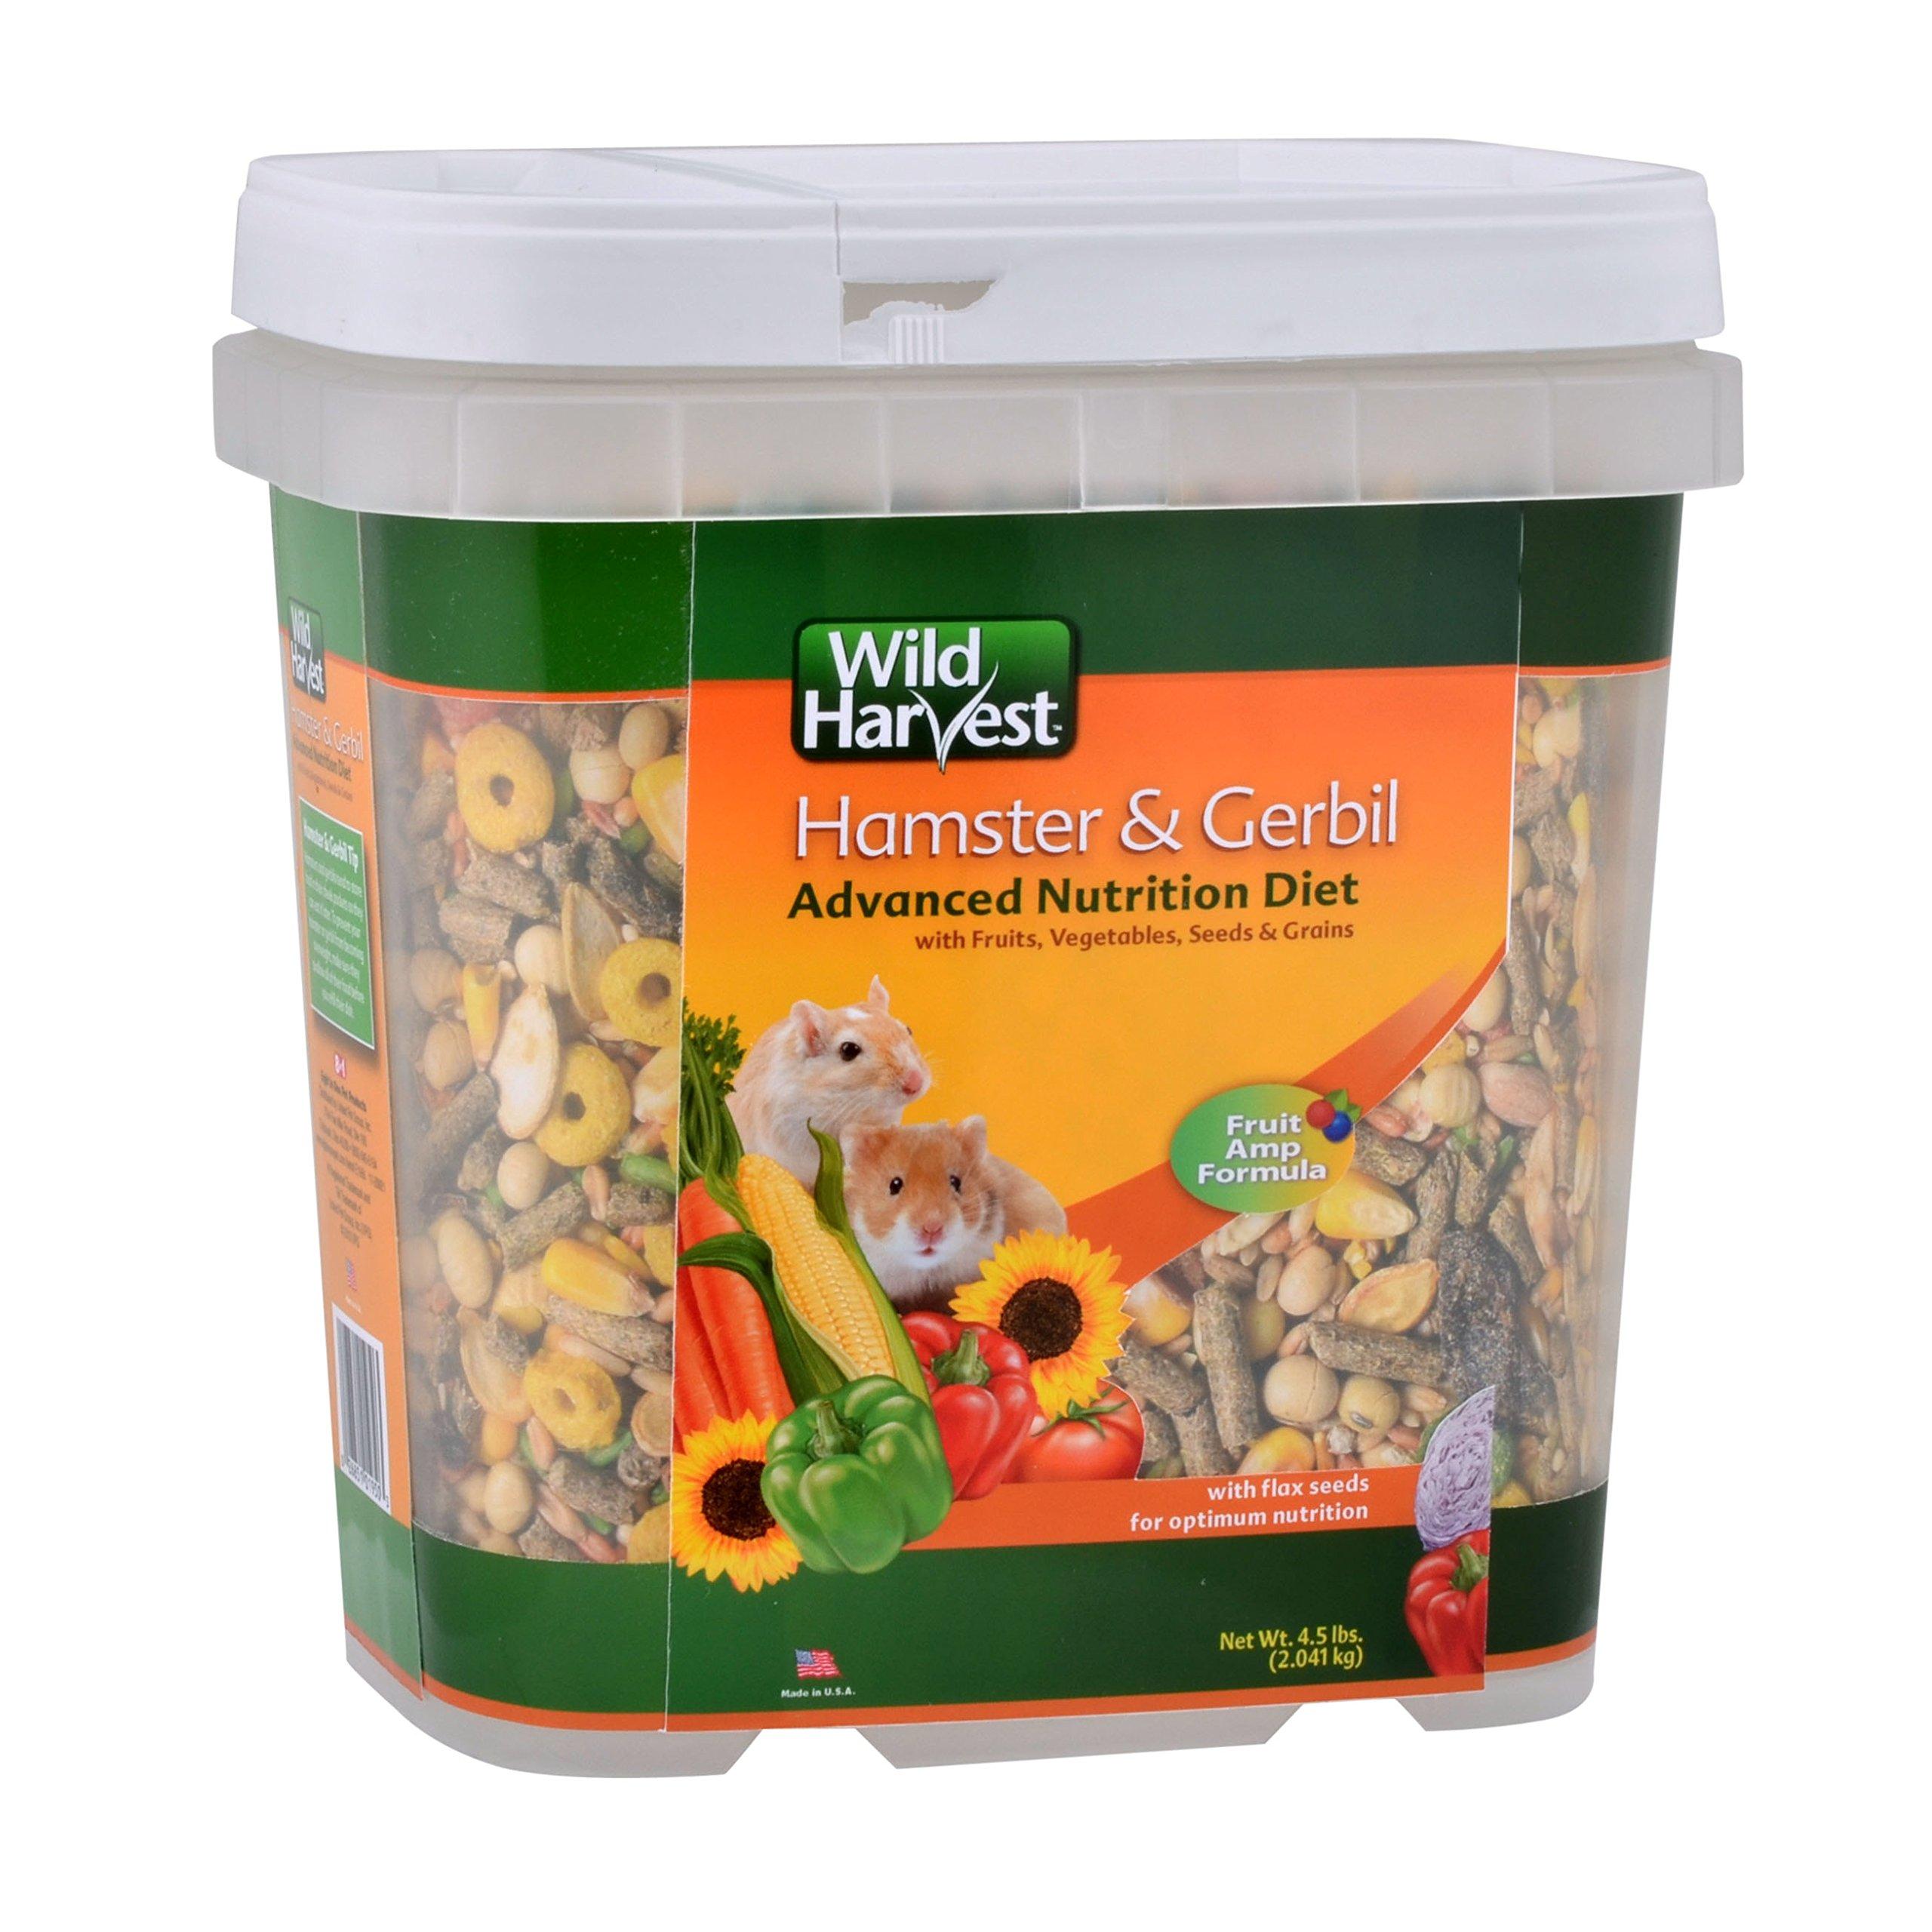 Wild Harvest Wh-83543 Wild Harvest Advanced Nutrition Diet For Hamsters Or Gerbils, 4.5-Pound by Wild Harvest